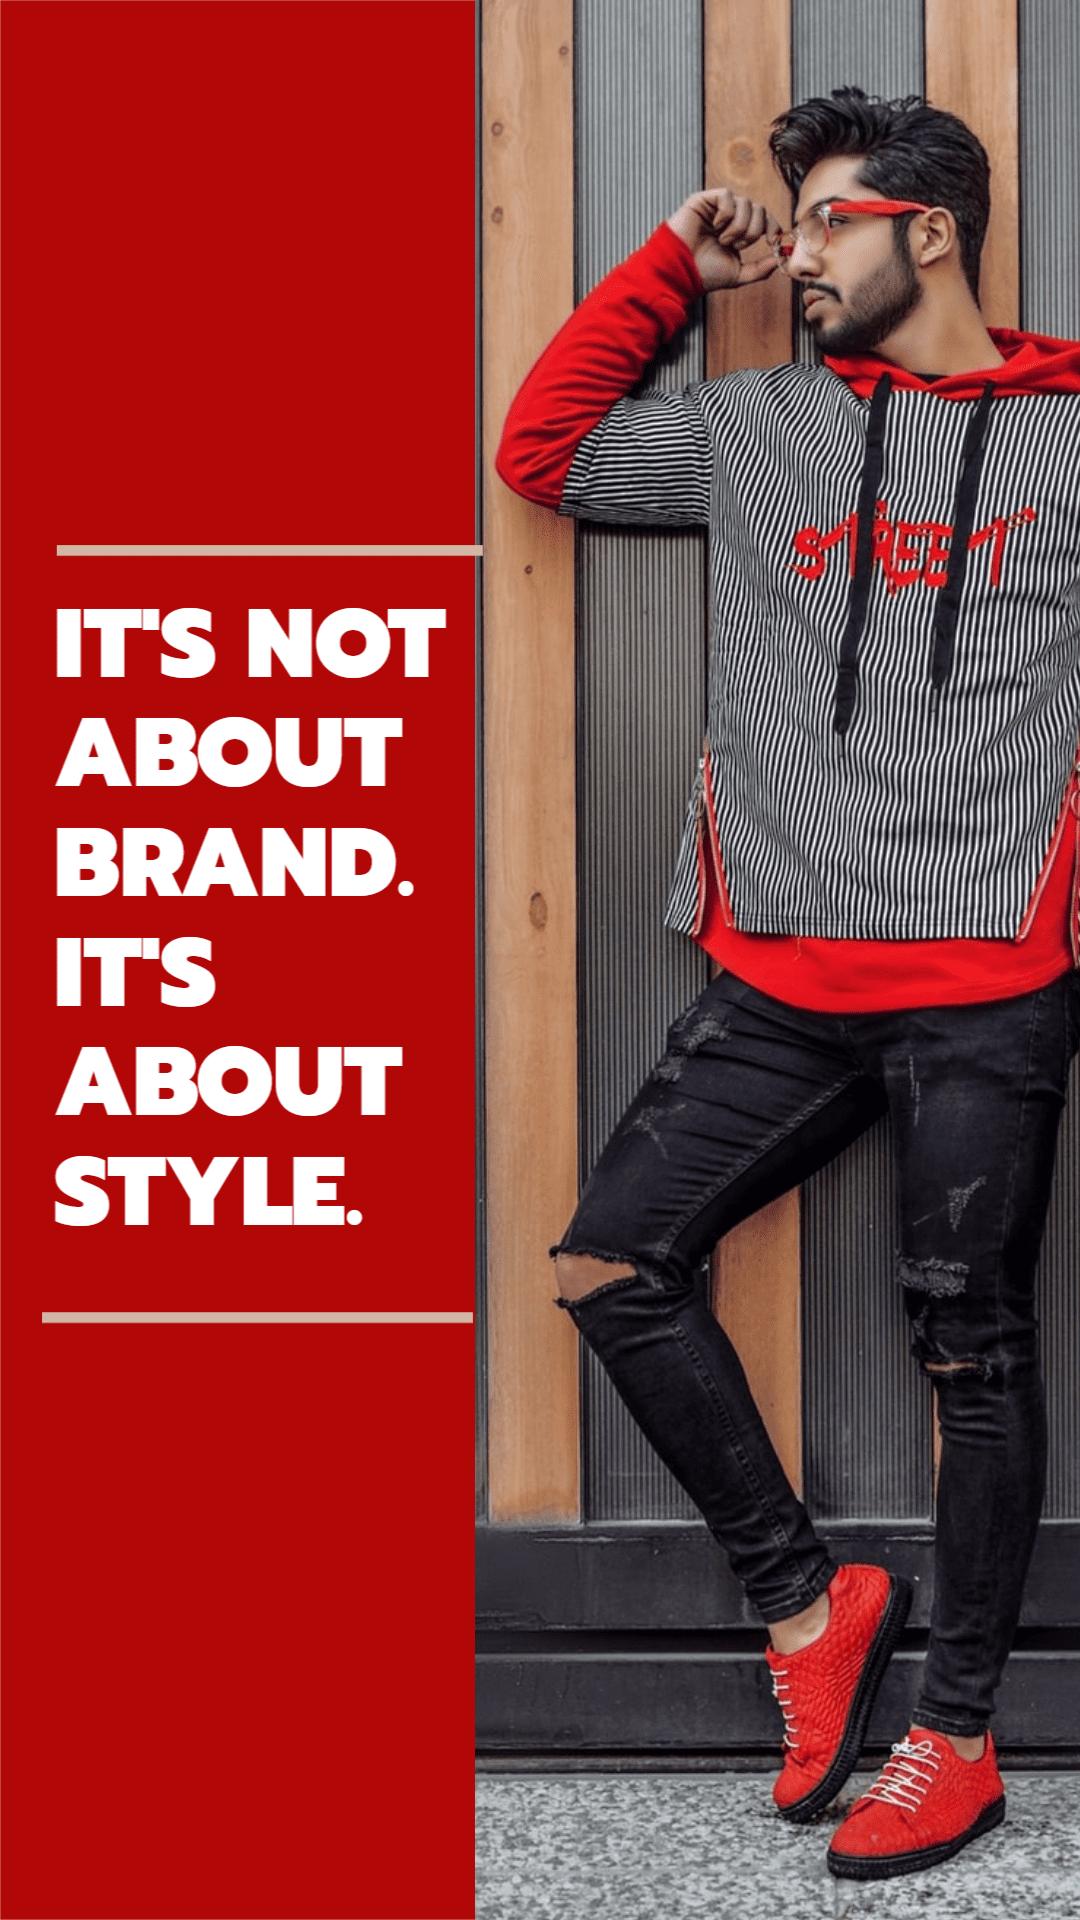 30-brand-design-instagram-story-template